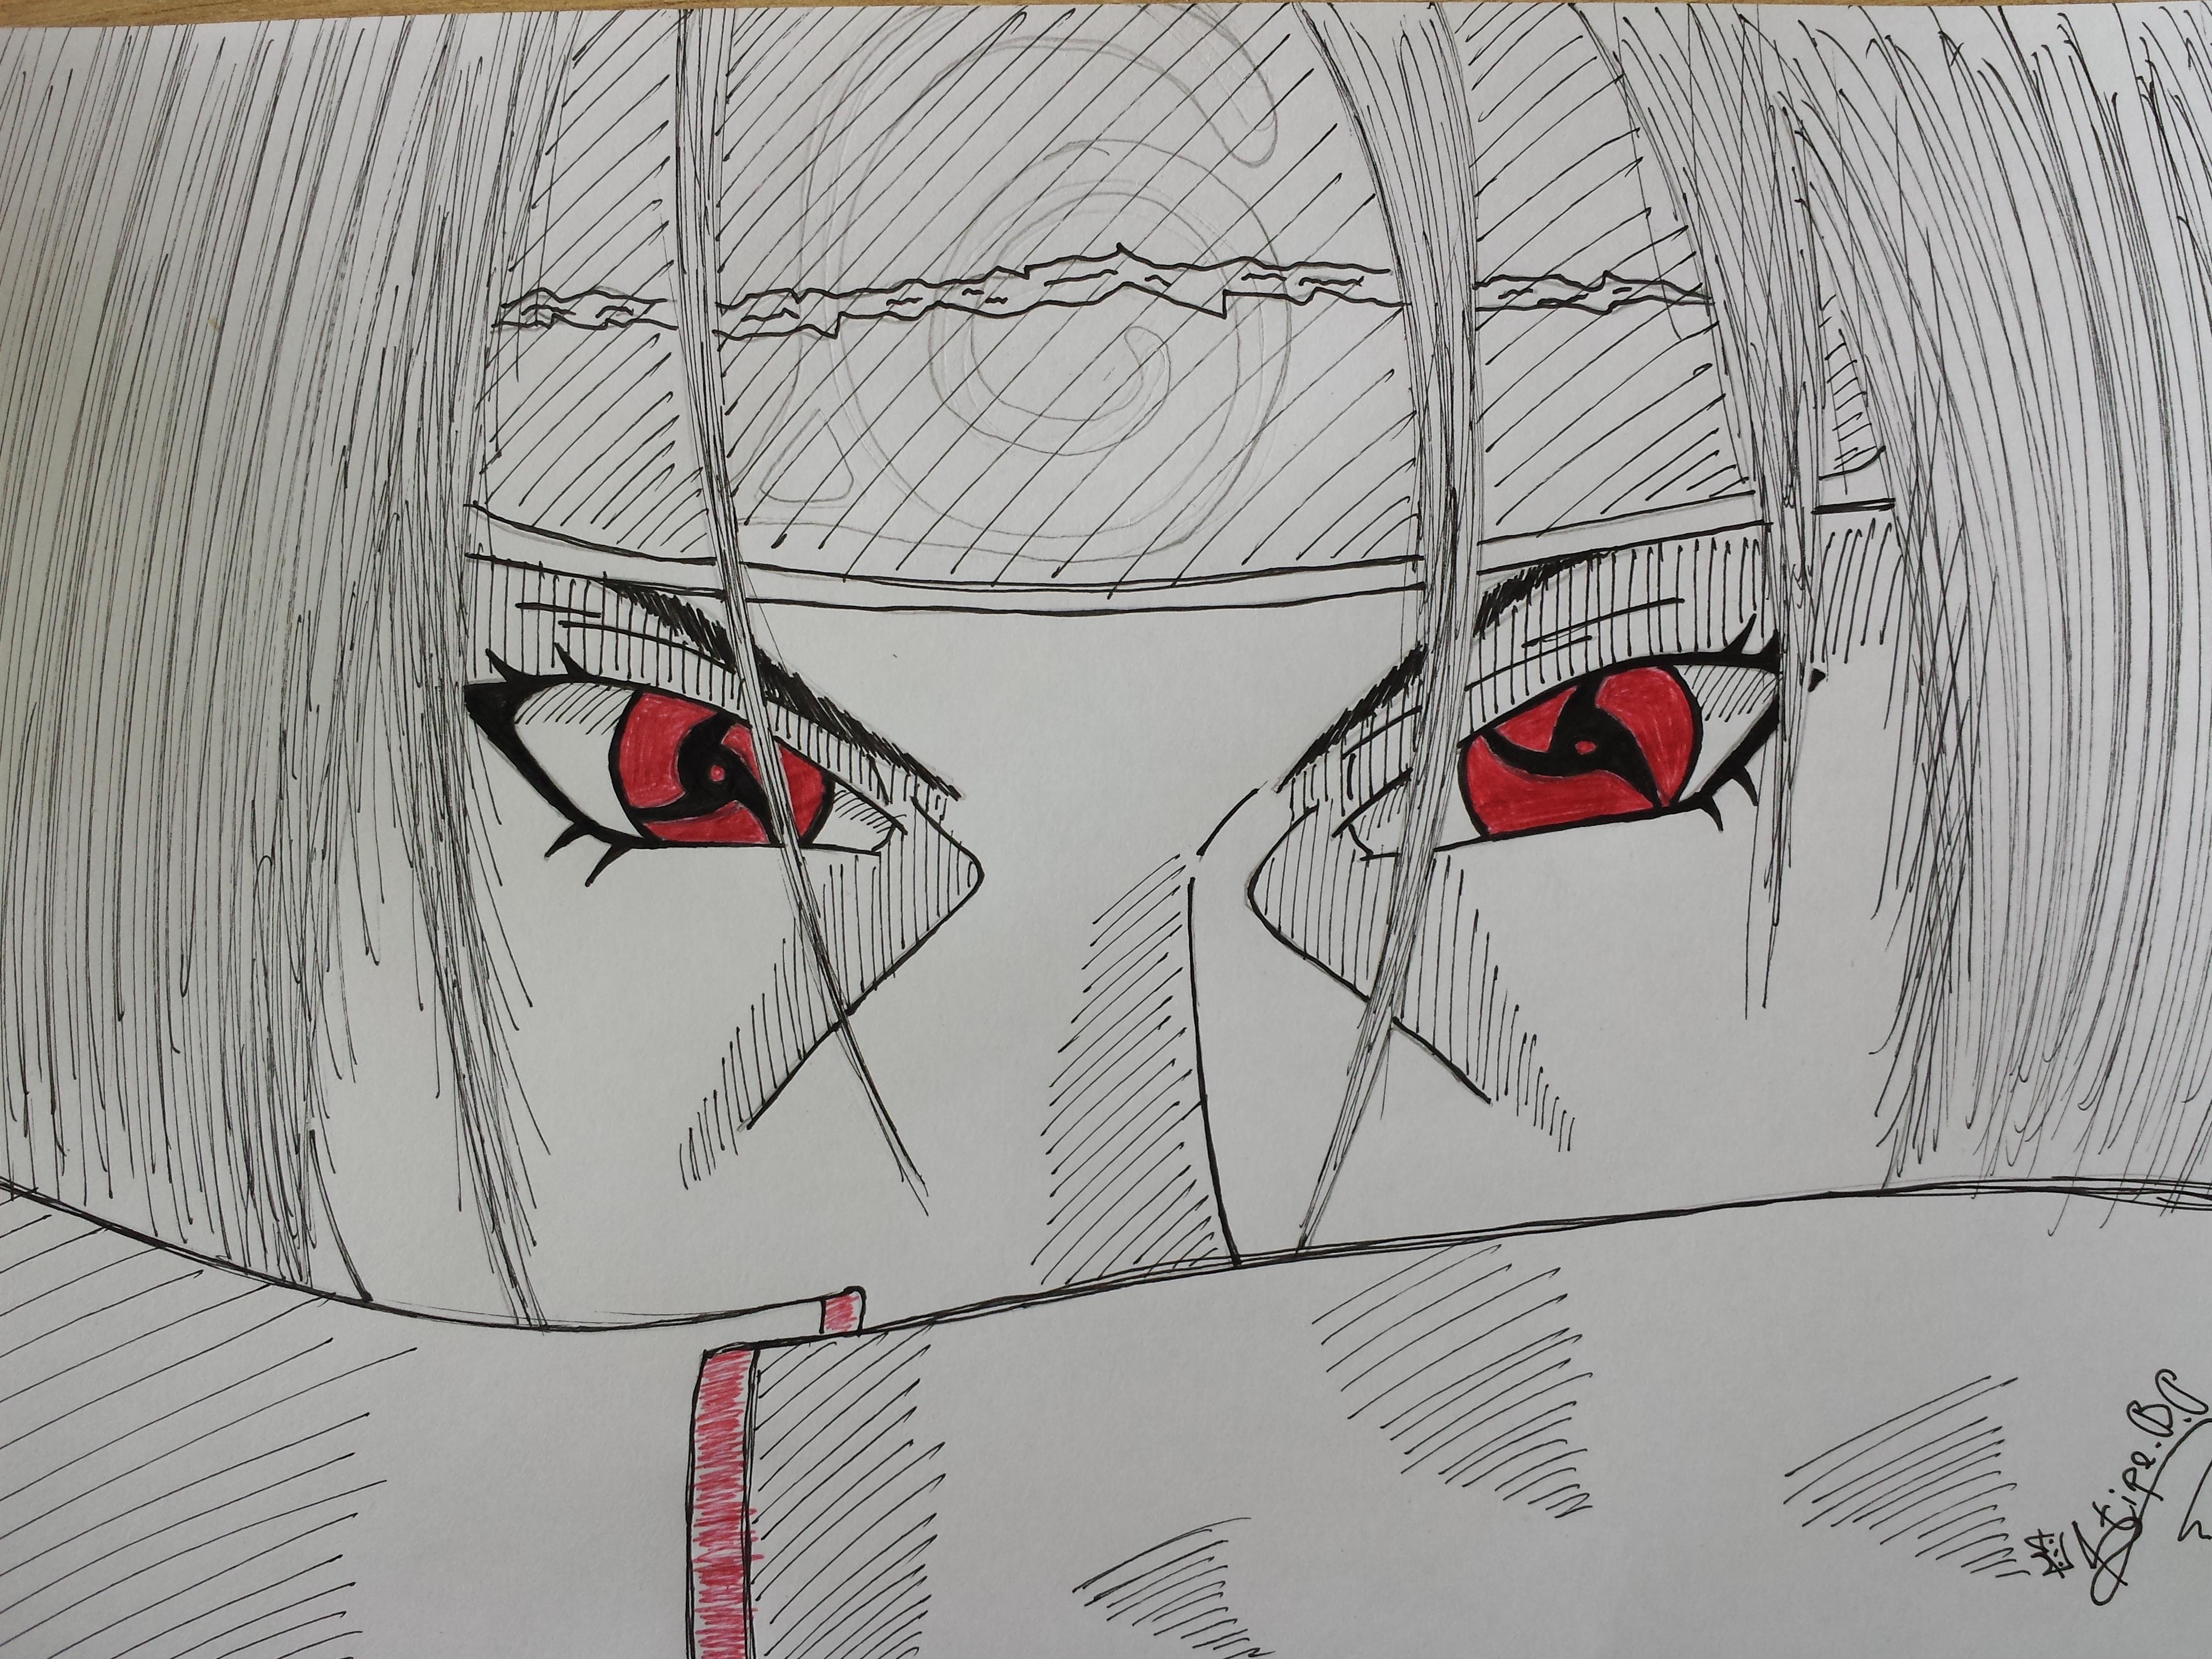 itachi uchiha mangekyou sharingan by stipe320